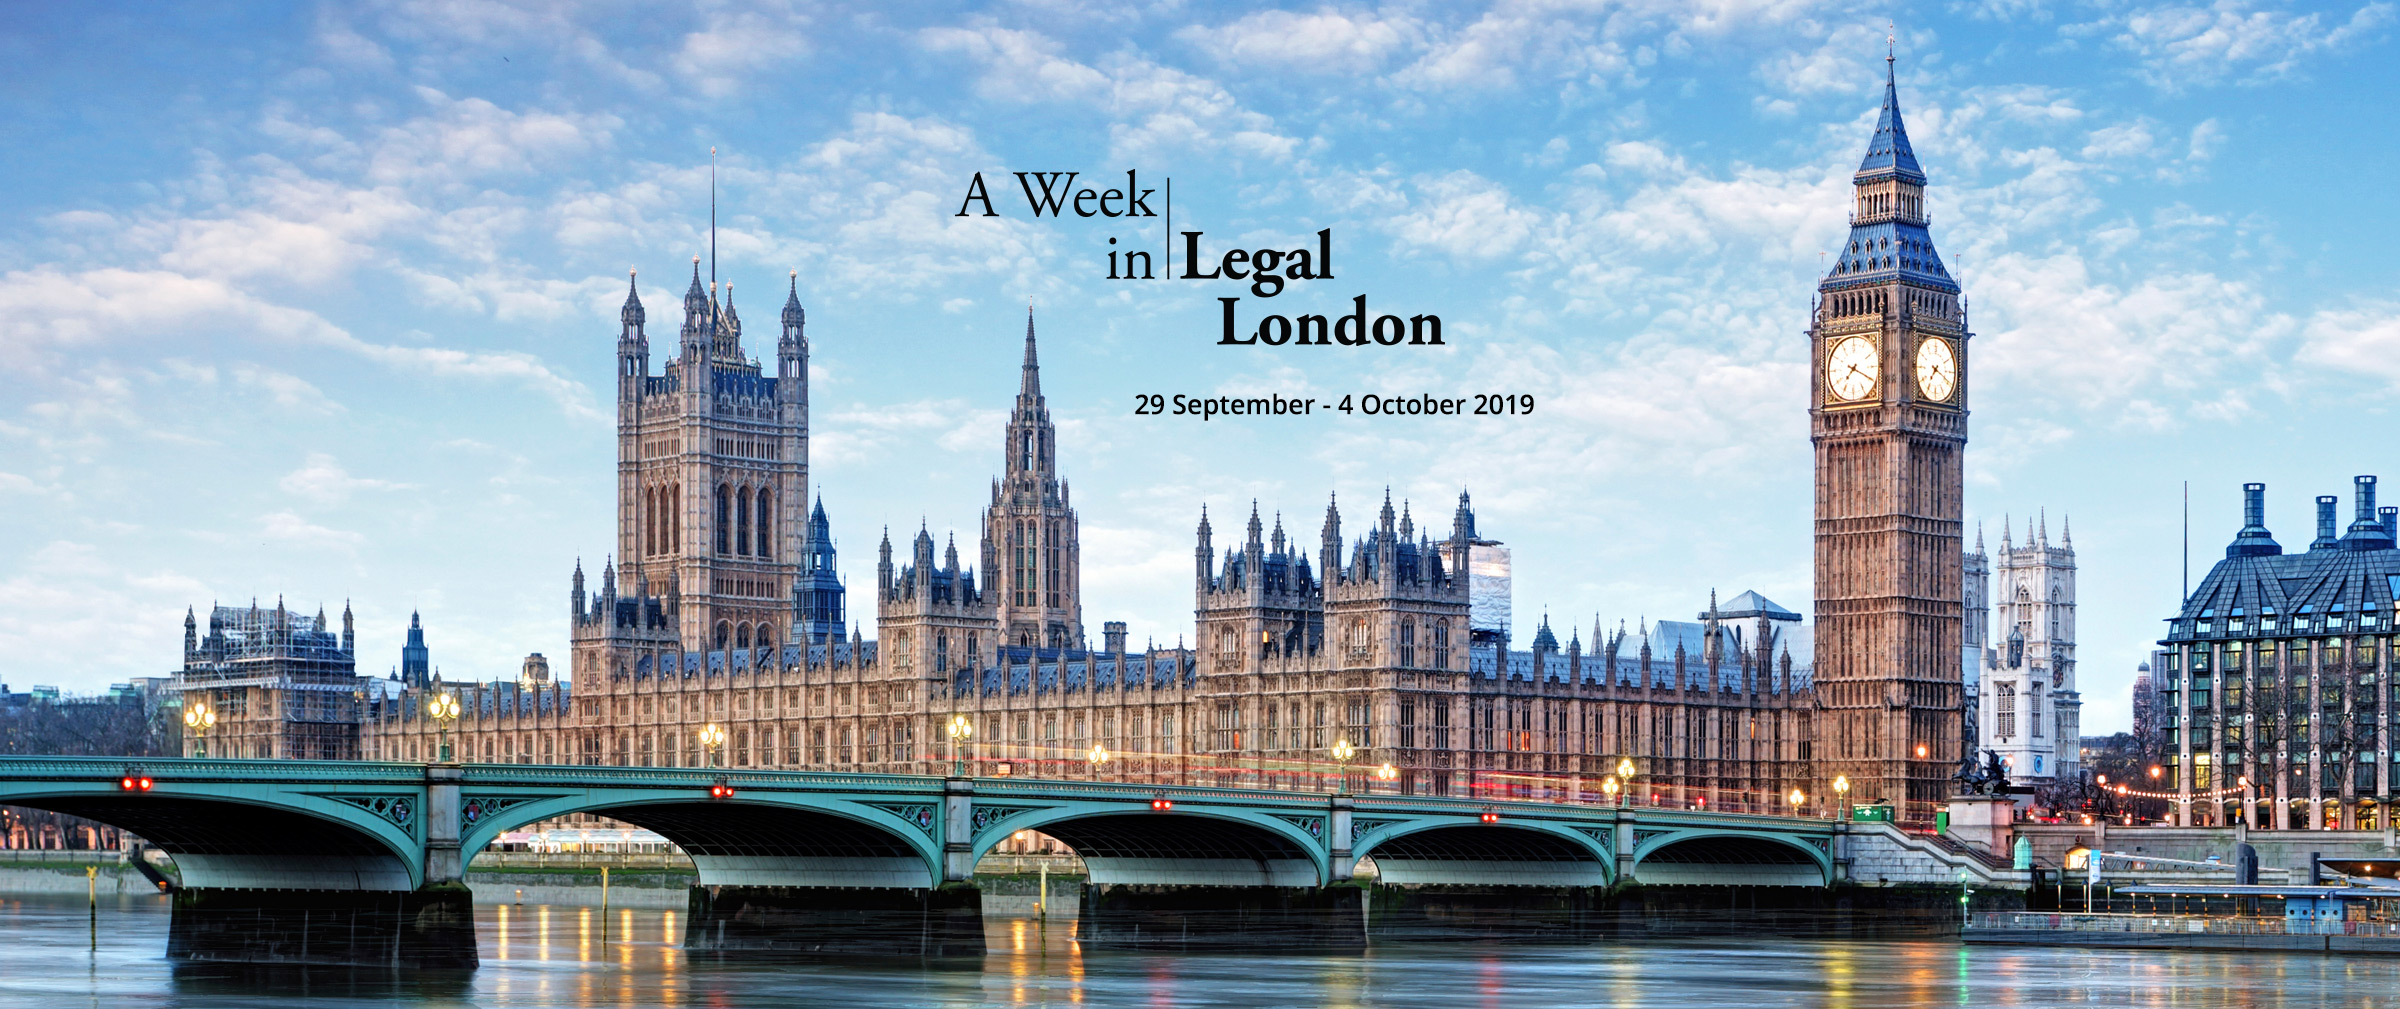 Legal London image